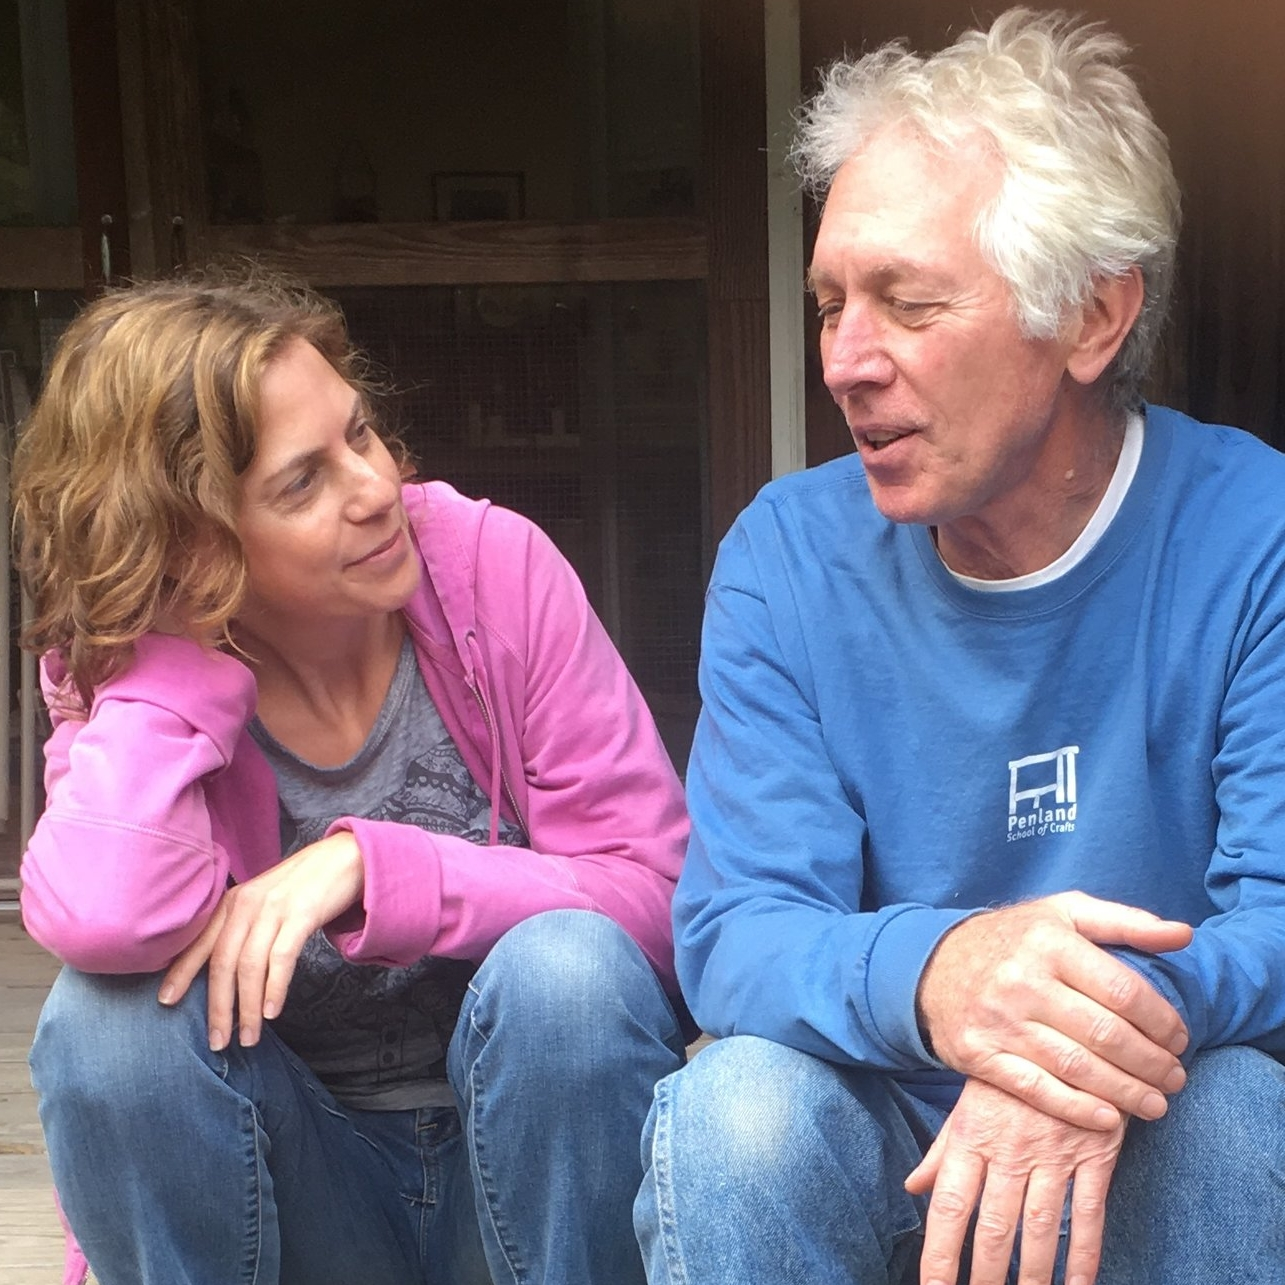 Nick Joerling and Liz Zlot Summerfield